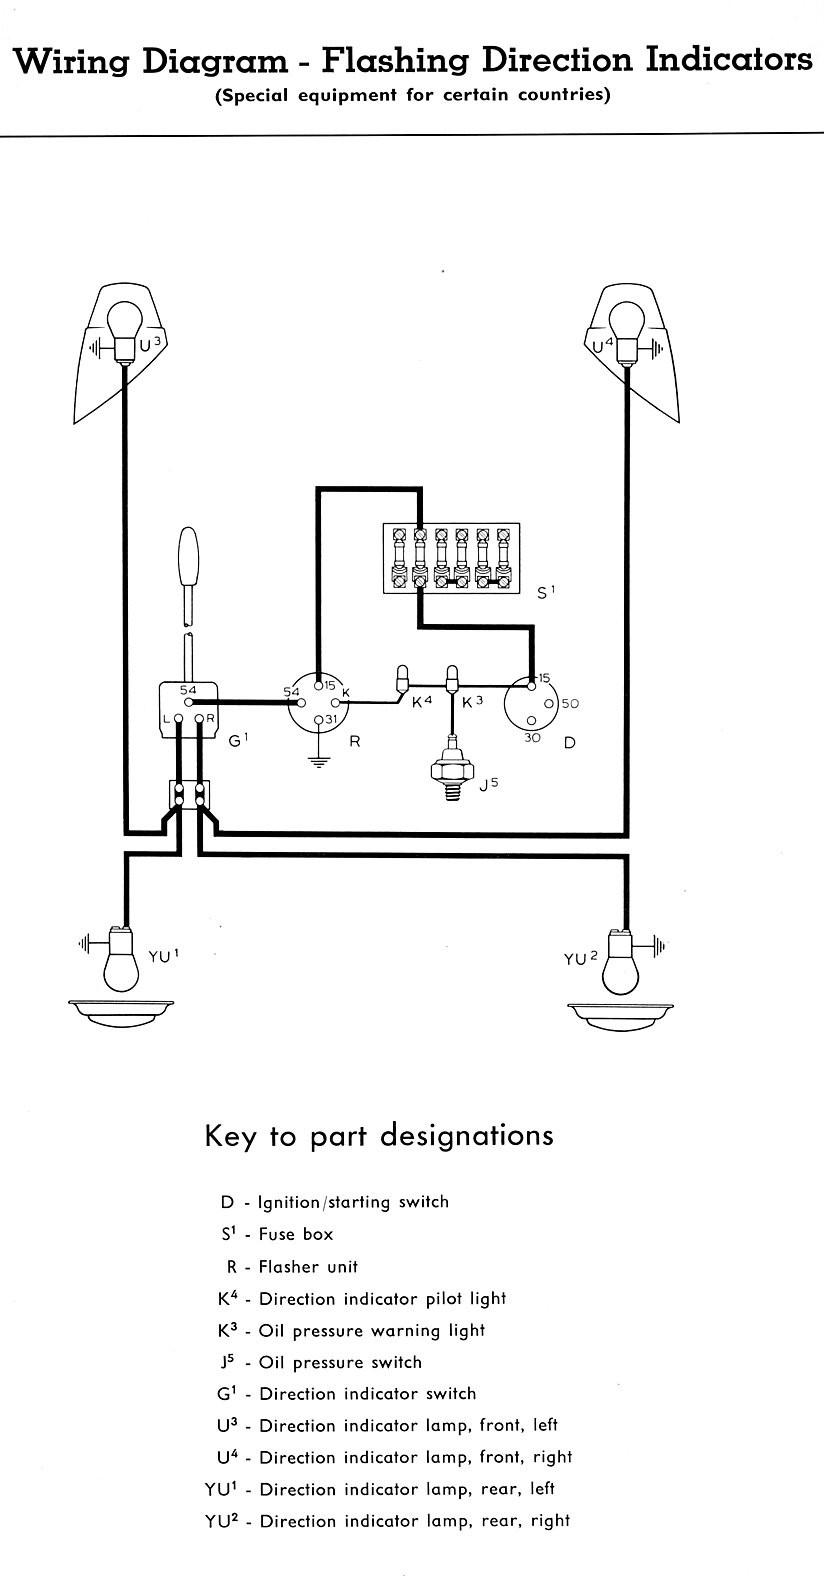 Turn signal wiring